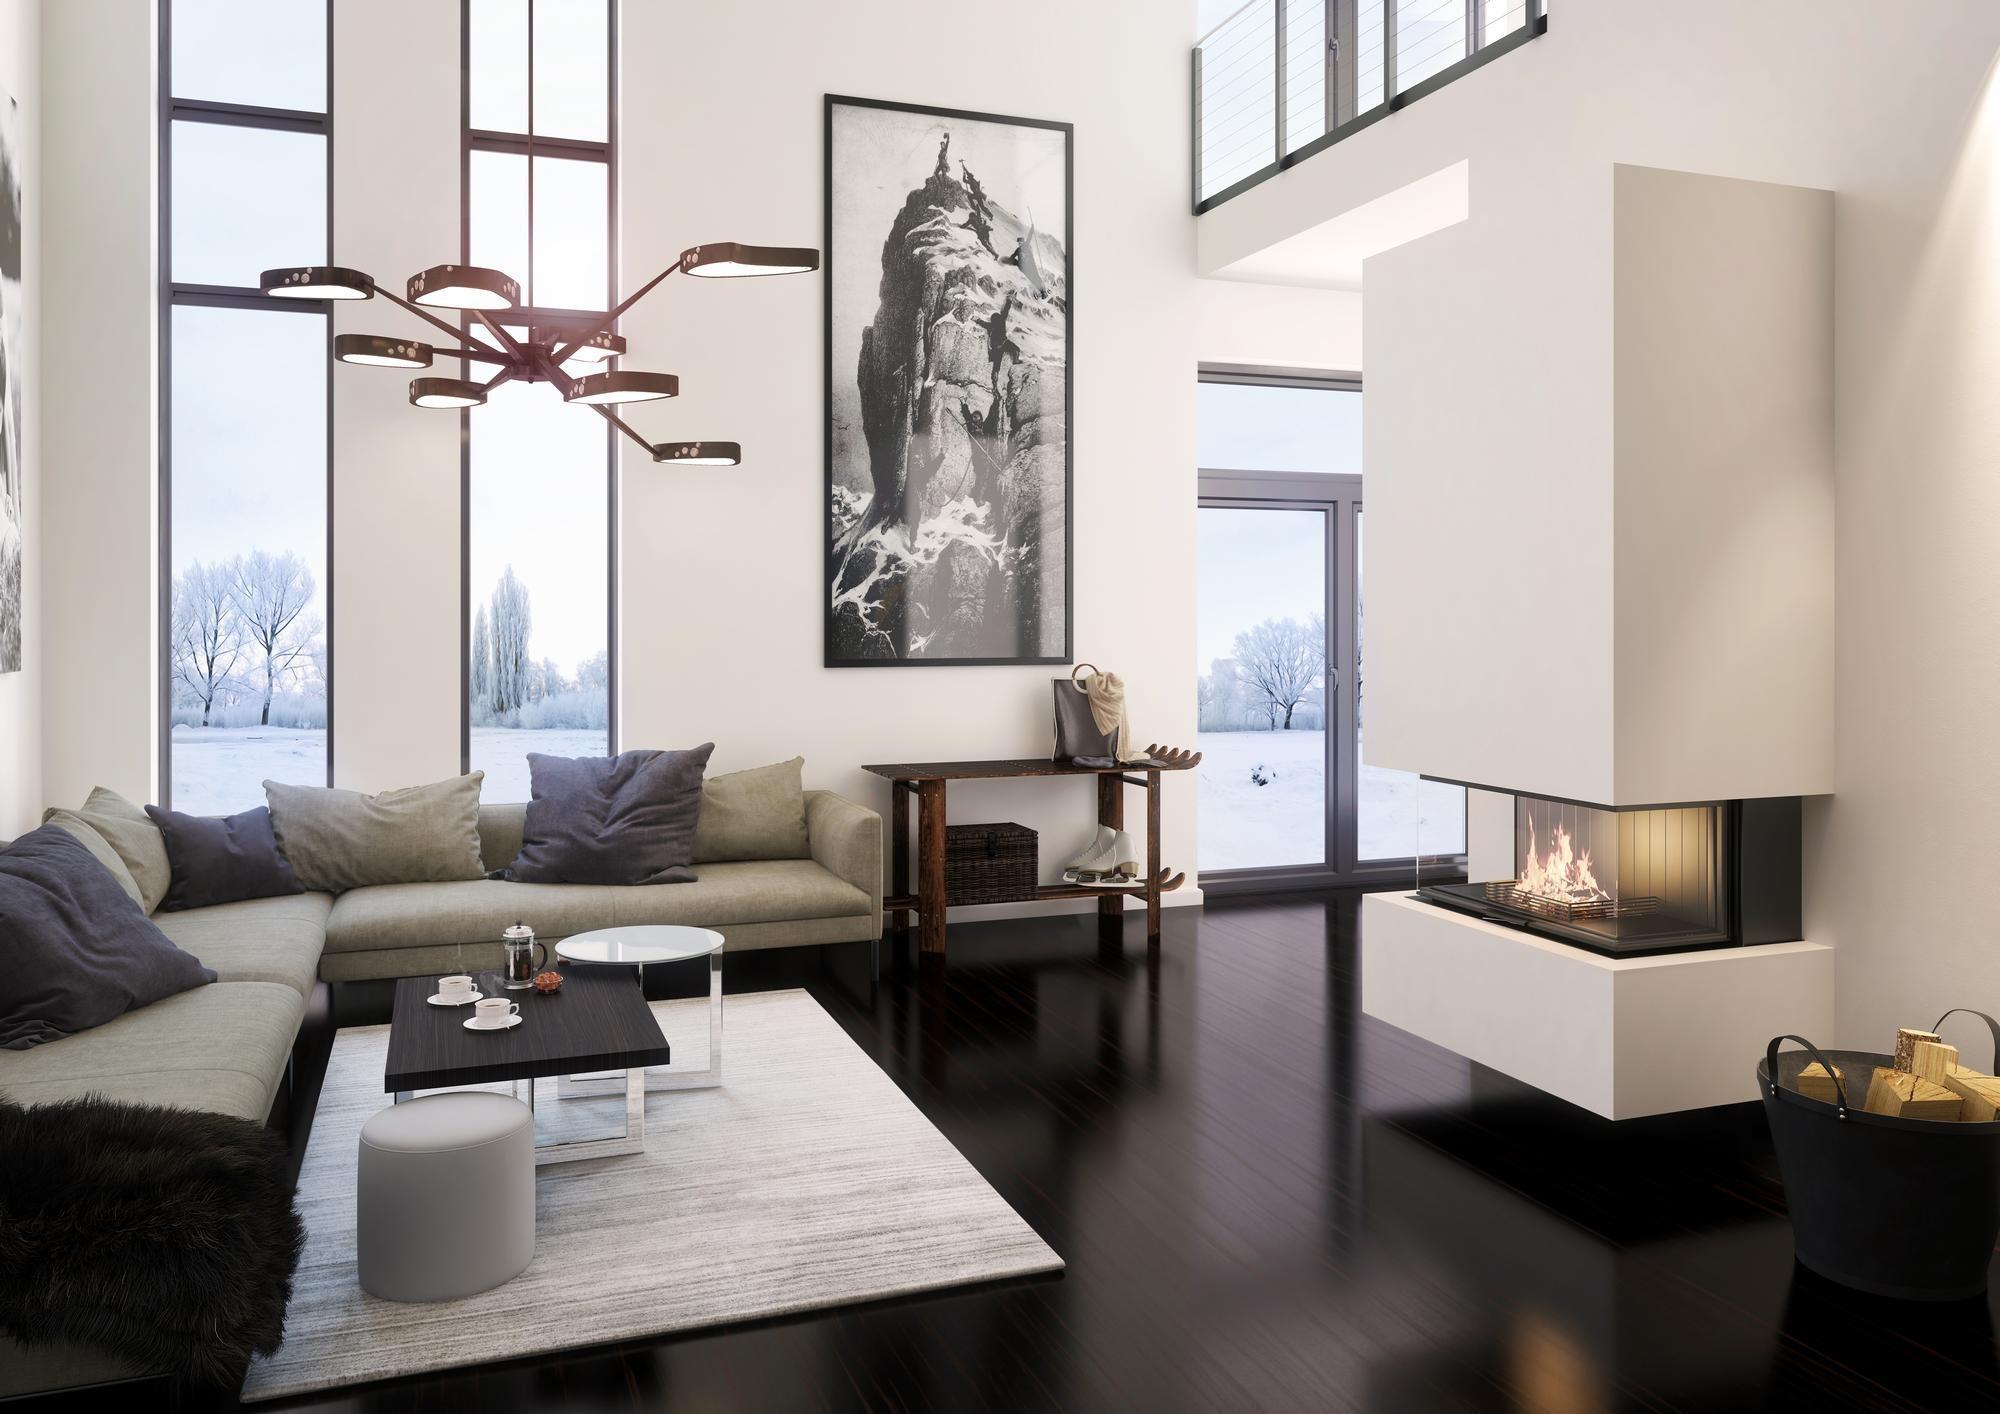 kamine kamine und kachel fen r egg studio dresden. Black Bedroom Furniture Sets. Home Design Ideas